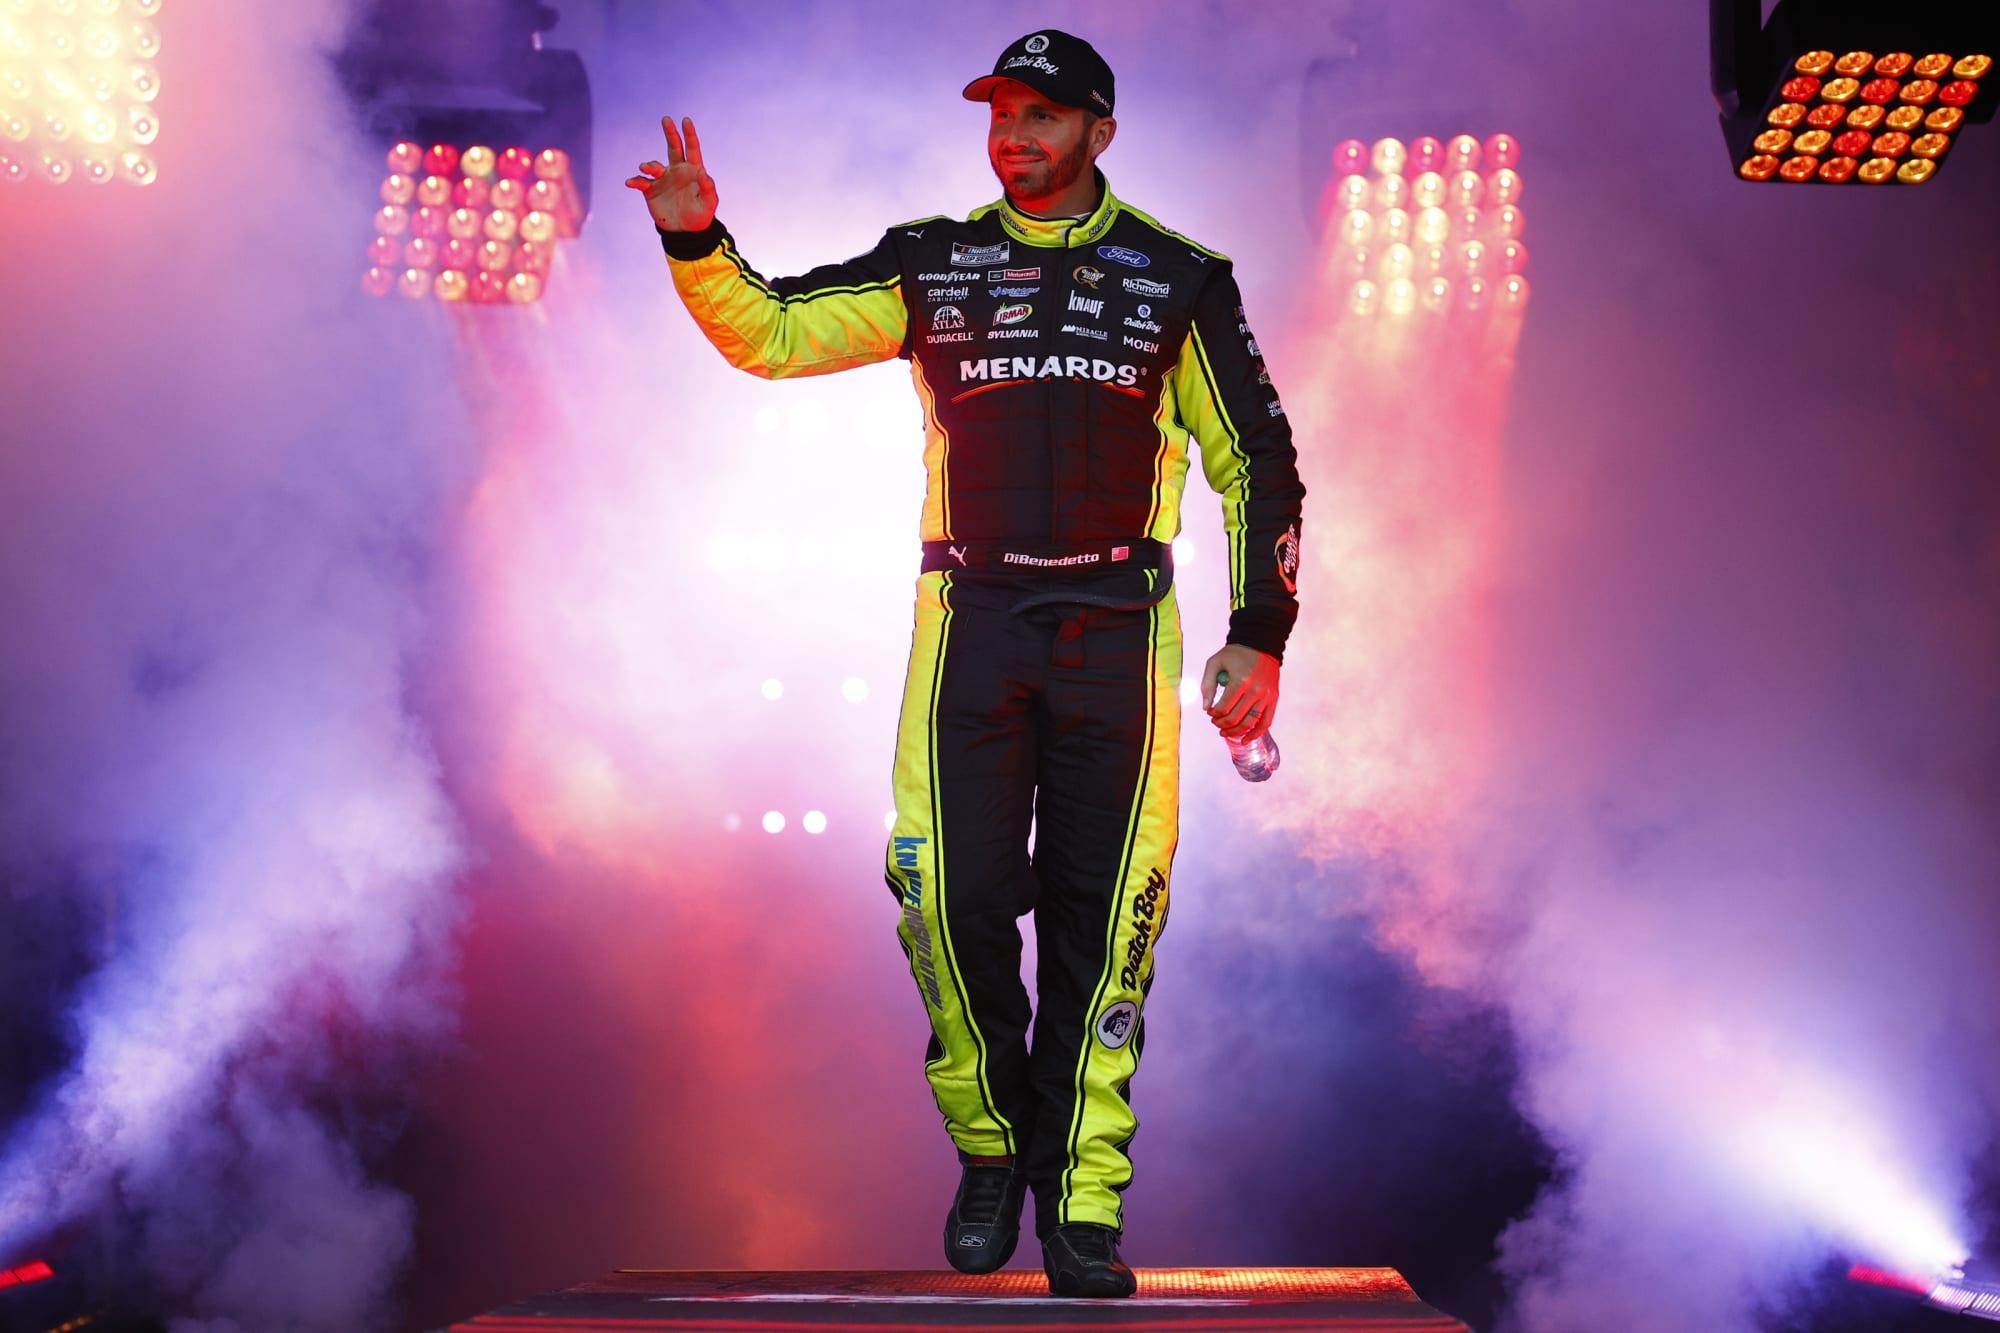 NASCAR: Matt DiBenedetto shoots down new contract rumor - Beyond the Flag